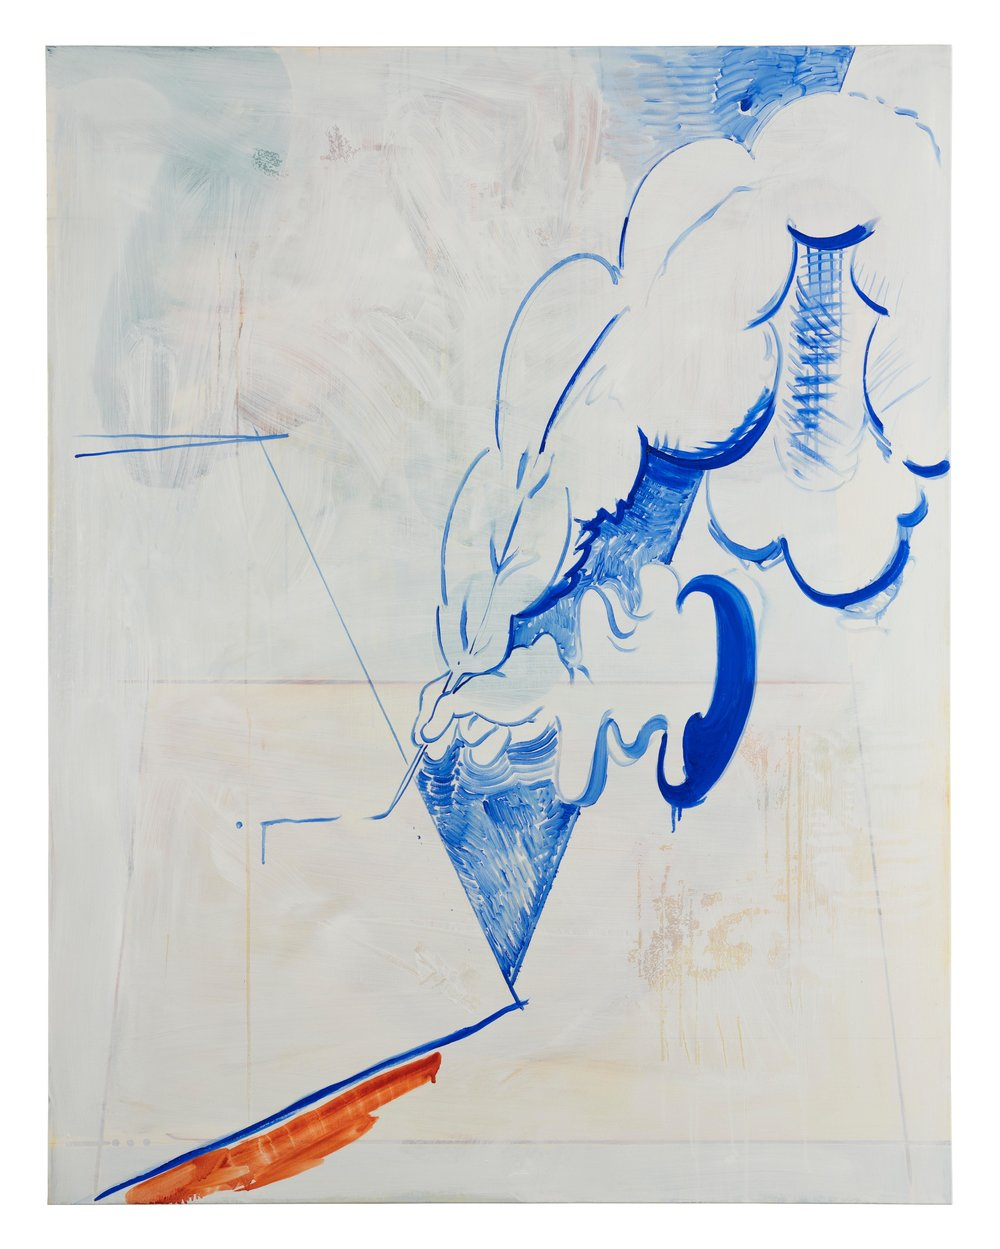 Ghostwriter, 2018, óleo sobre lino, 146 x 114 cm